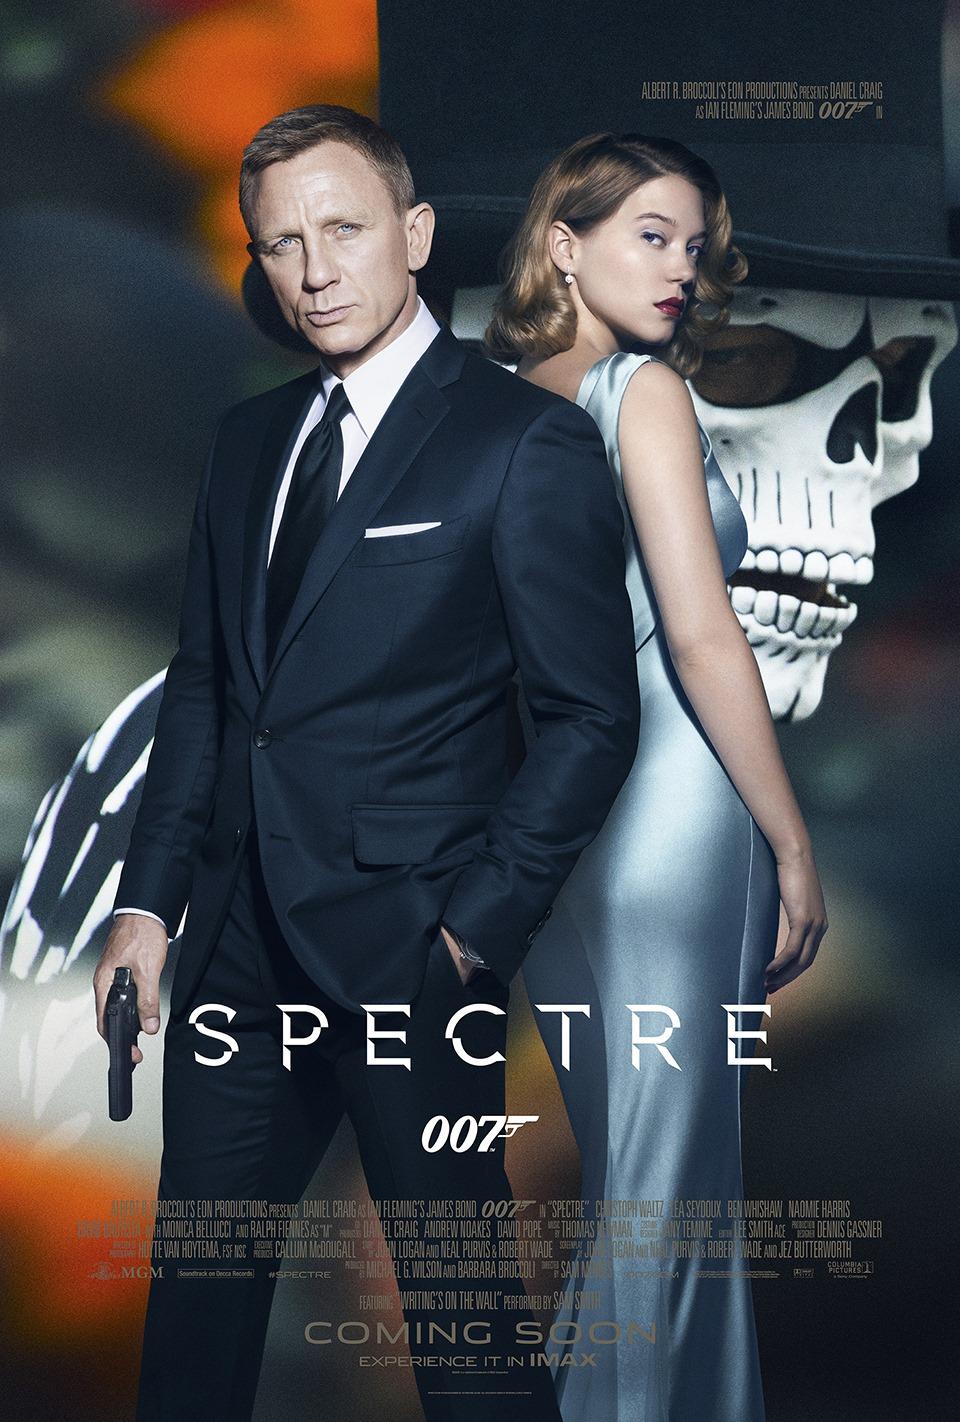 Spectre   (2015) dir. Sam Mendes Rated: PG-13 image:©2015  MGM